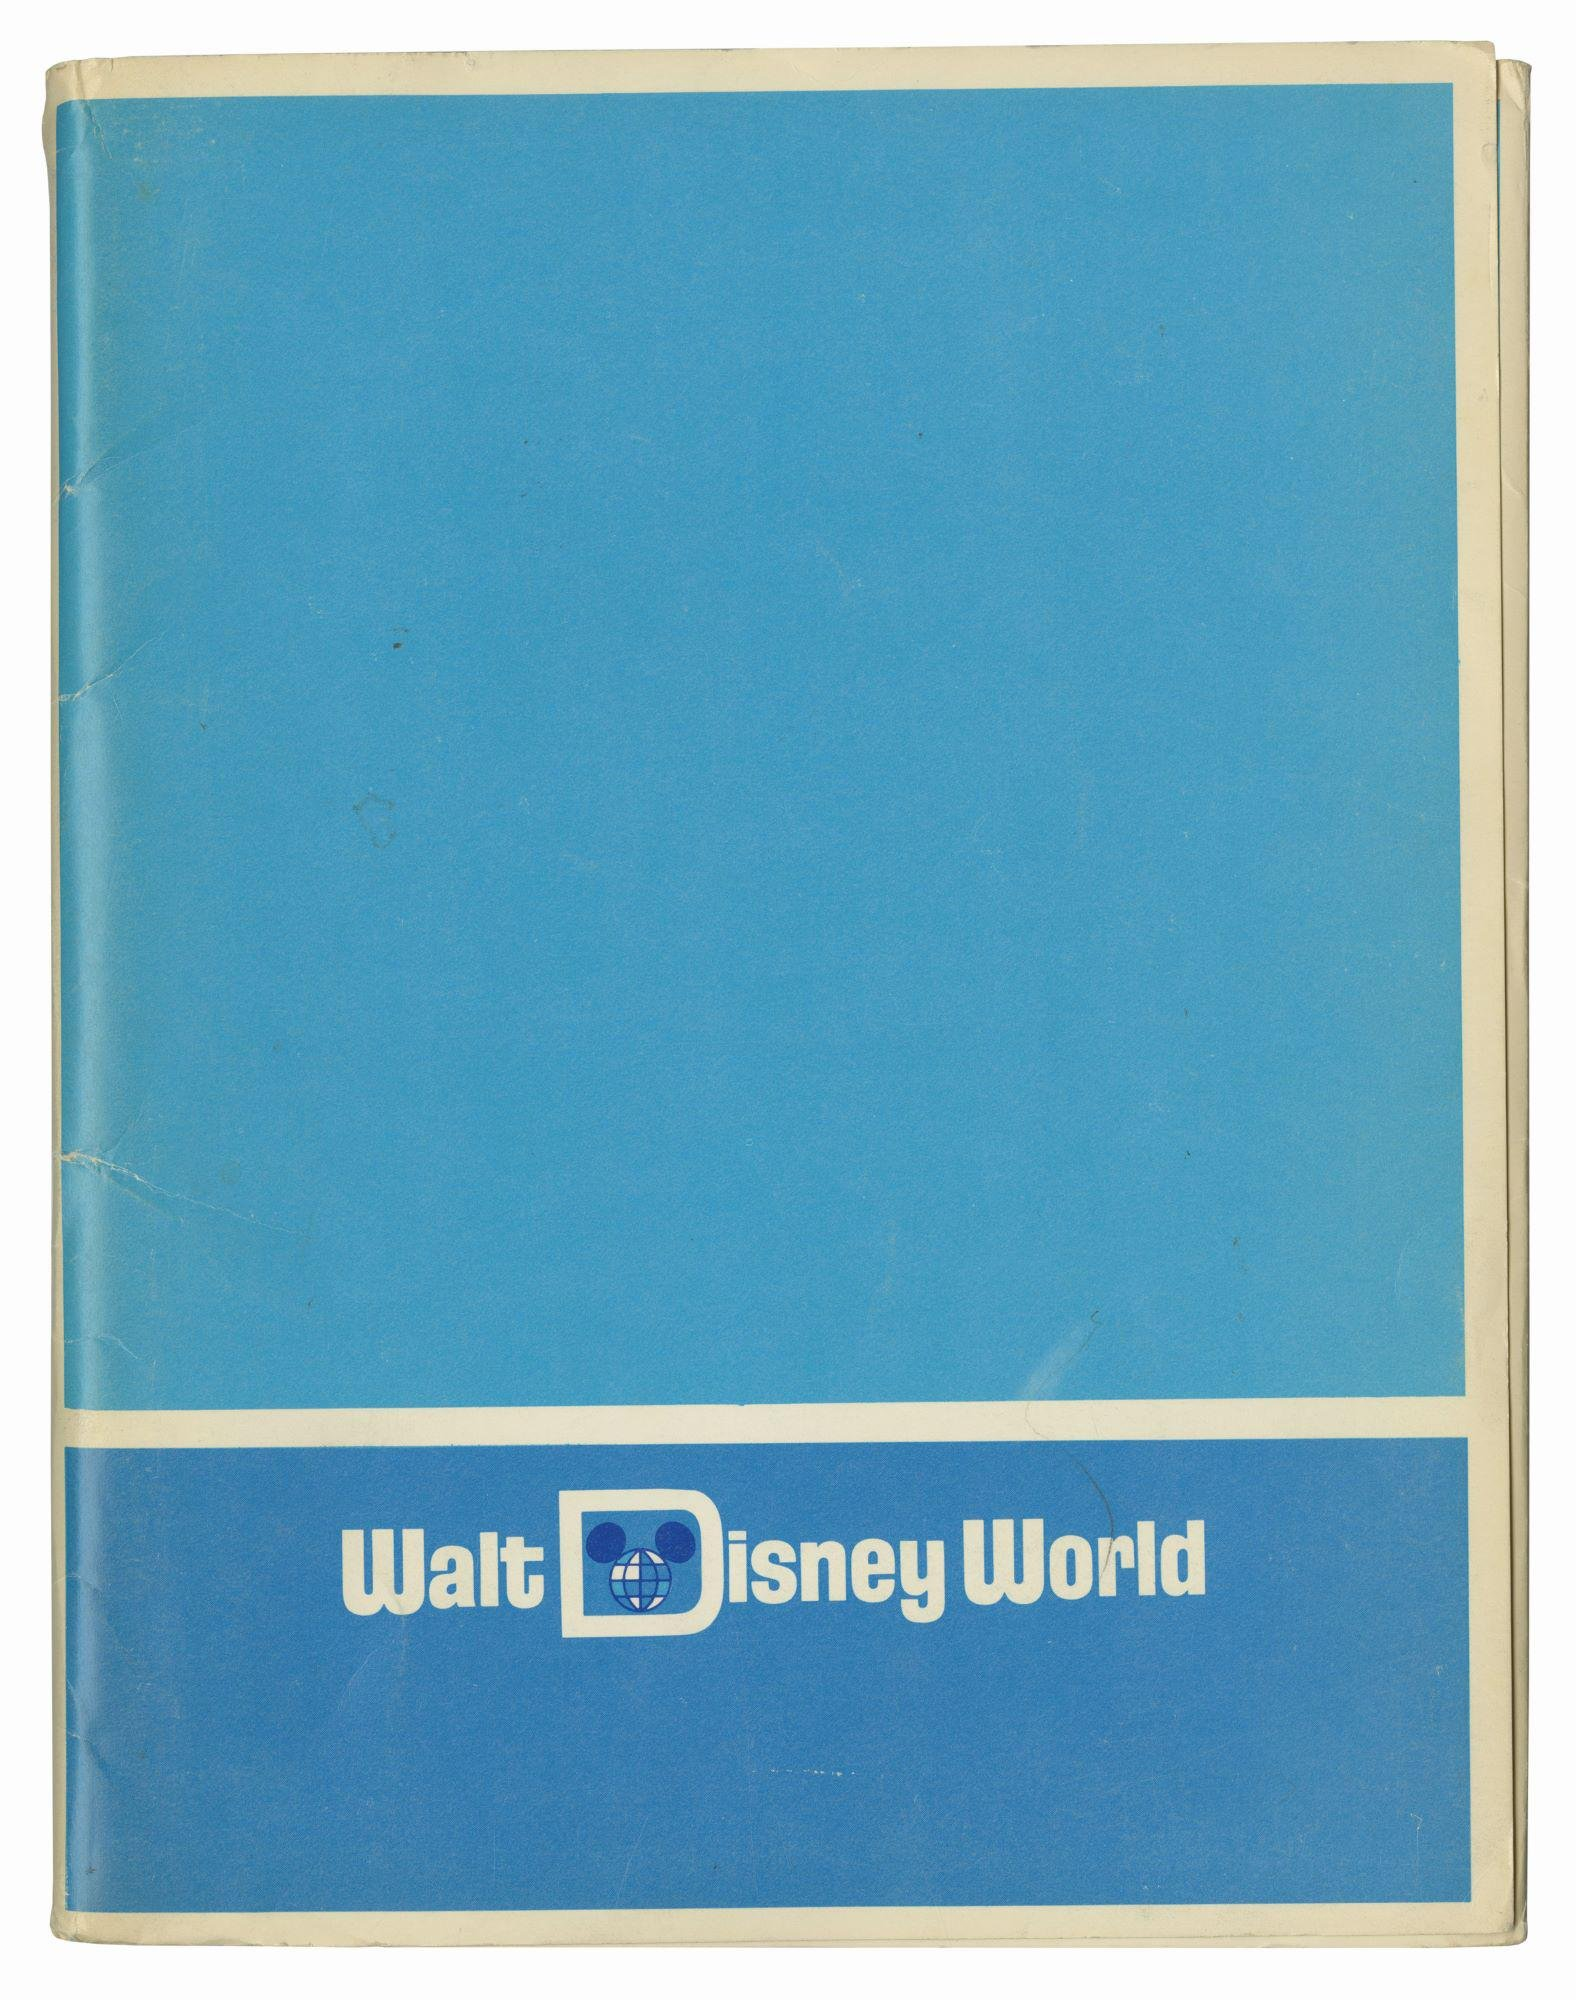 Walt Disney World Press Kit.